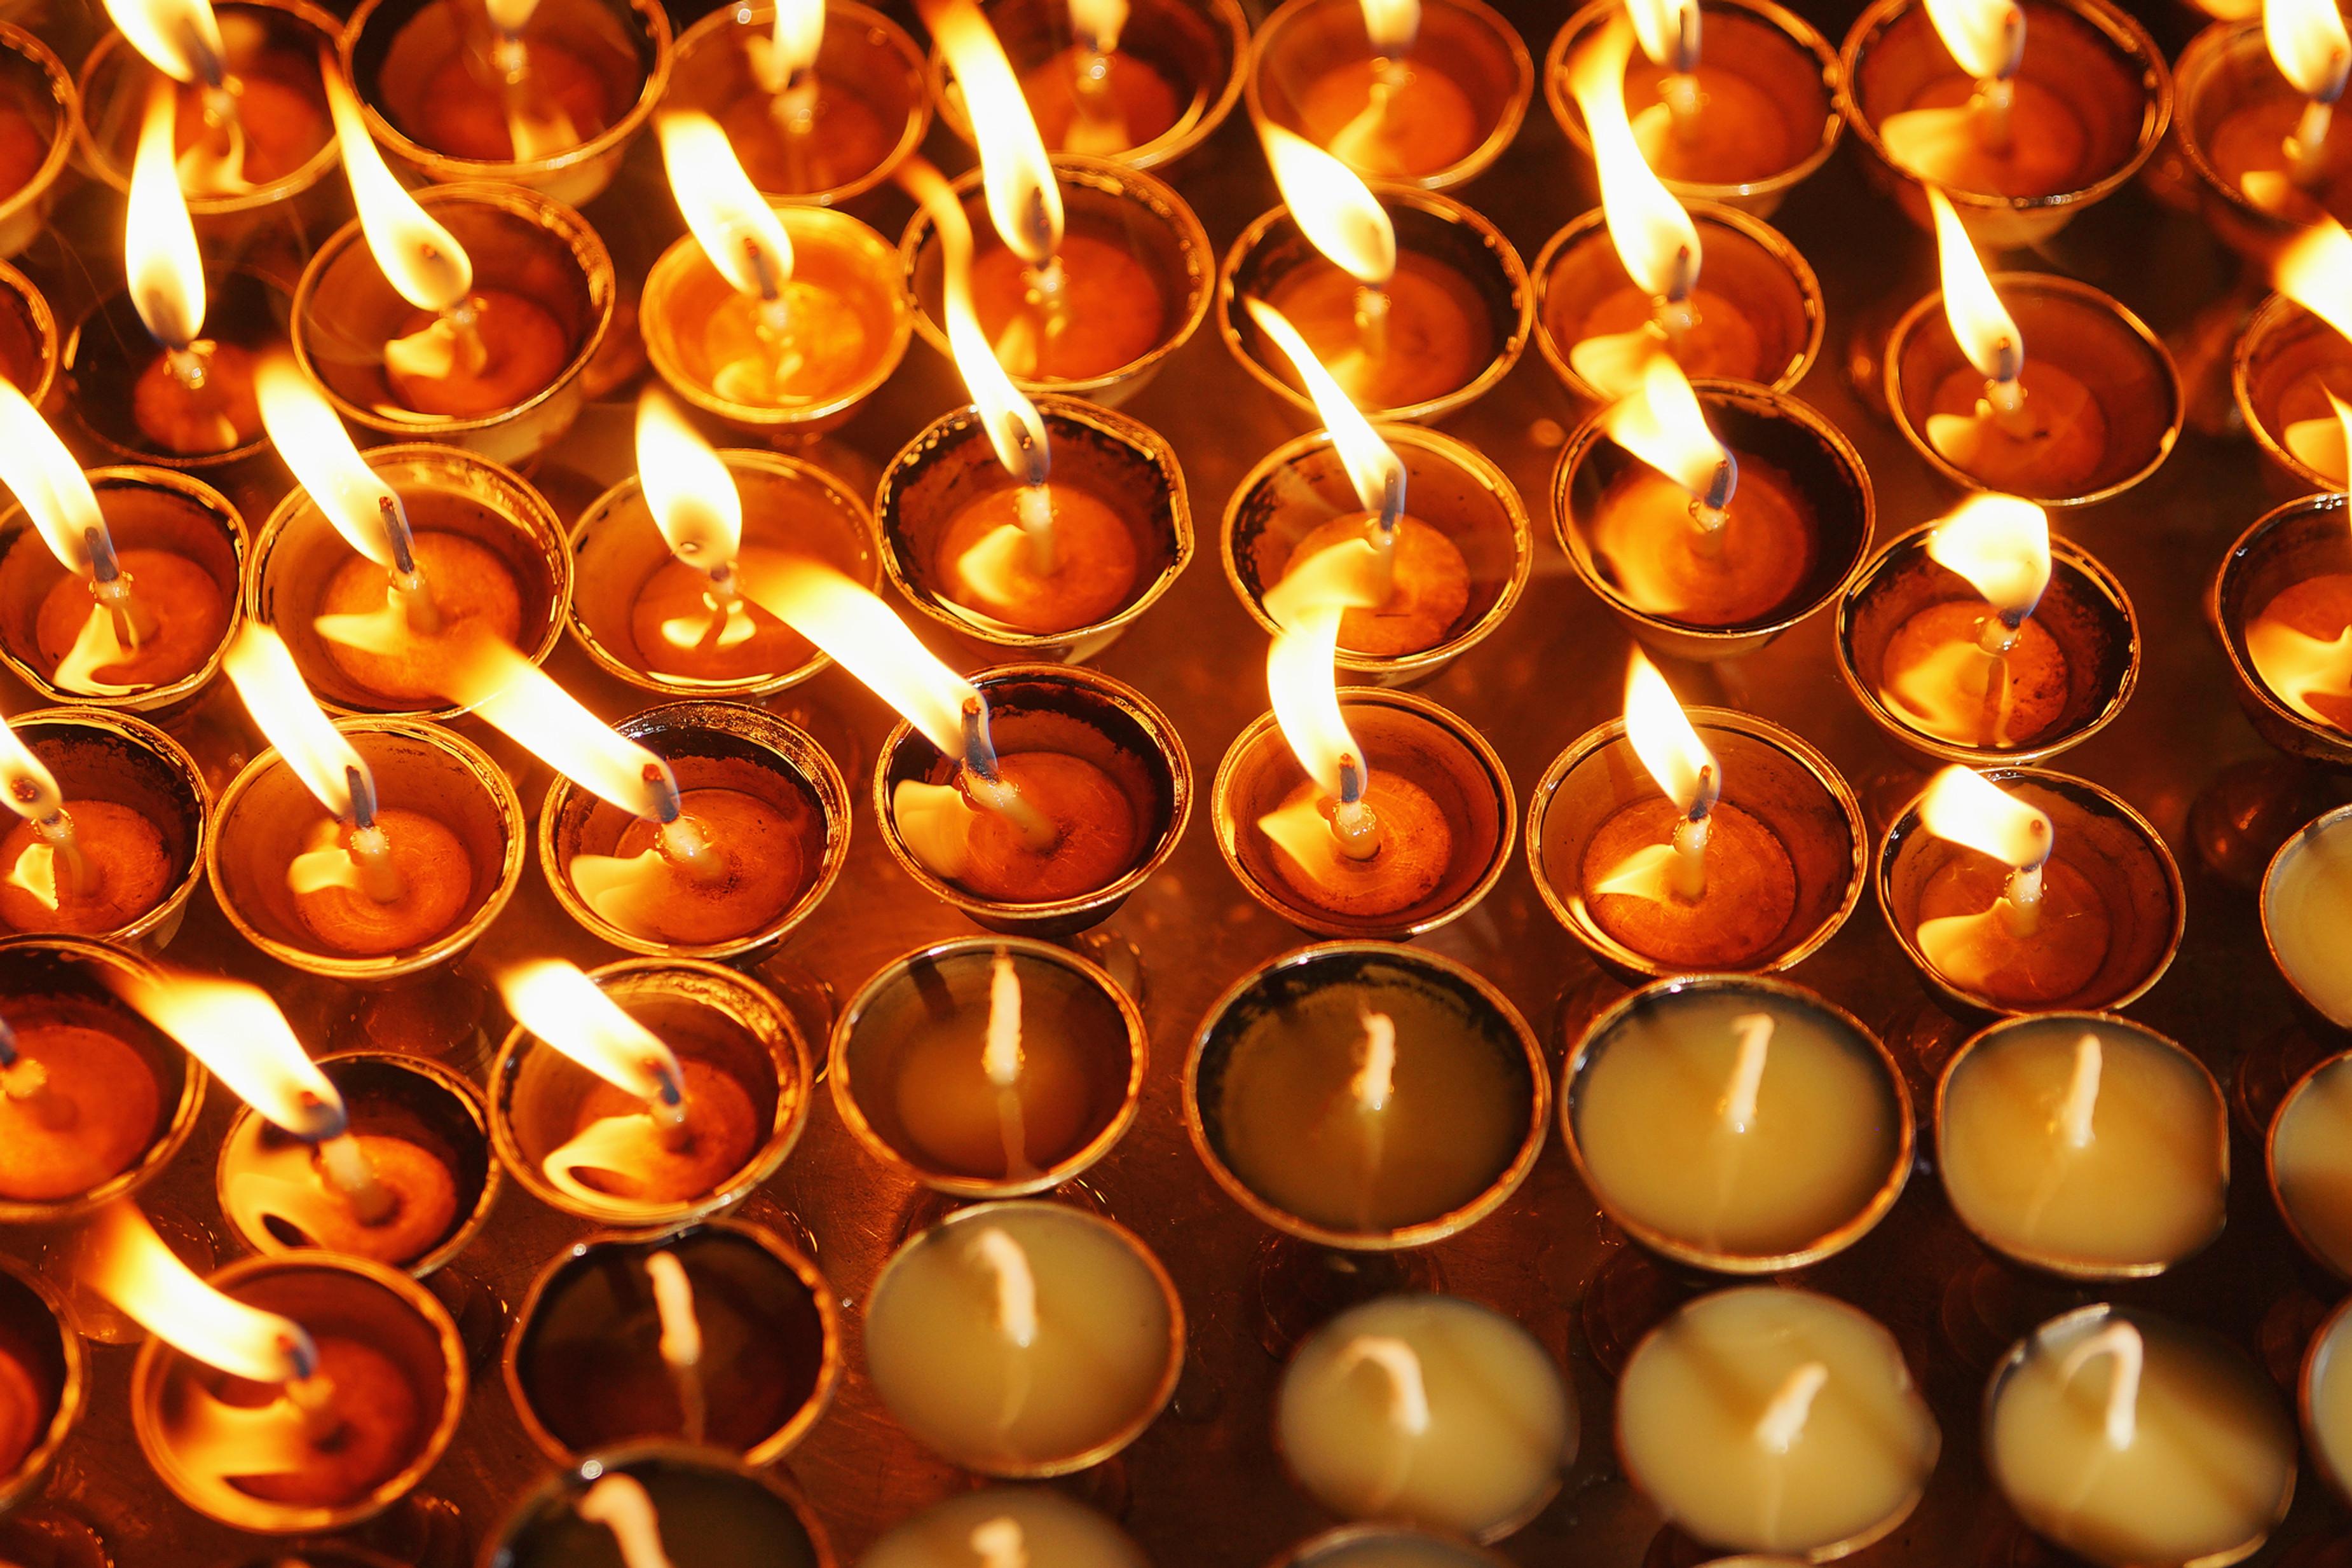 7-Minute Morning Prayer or Libation Call